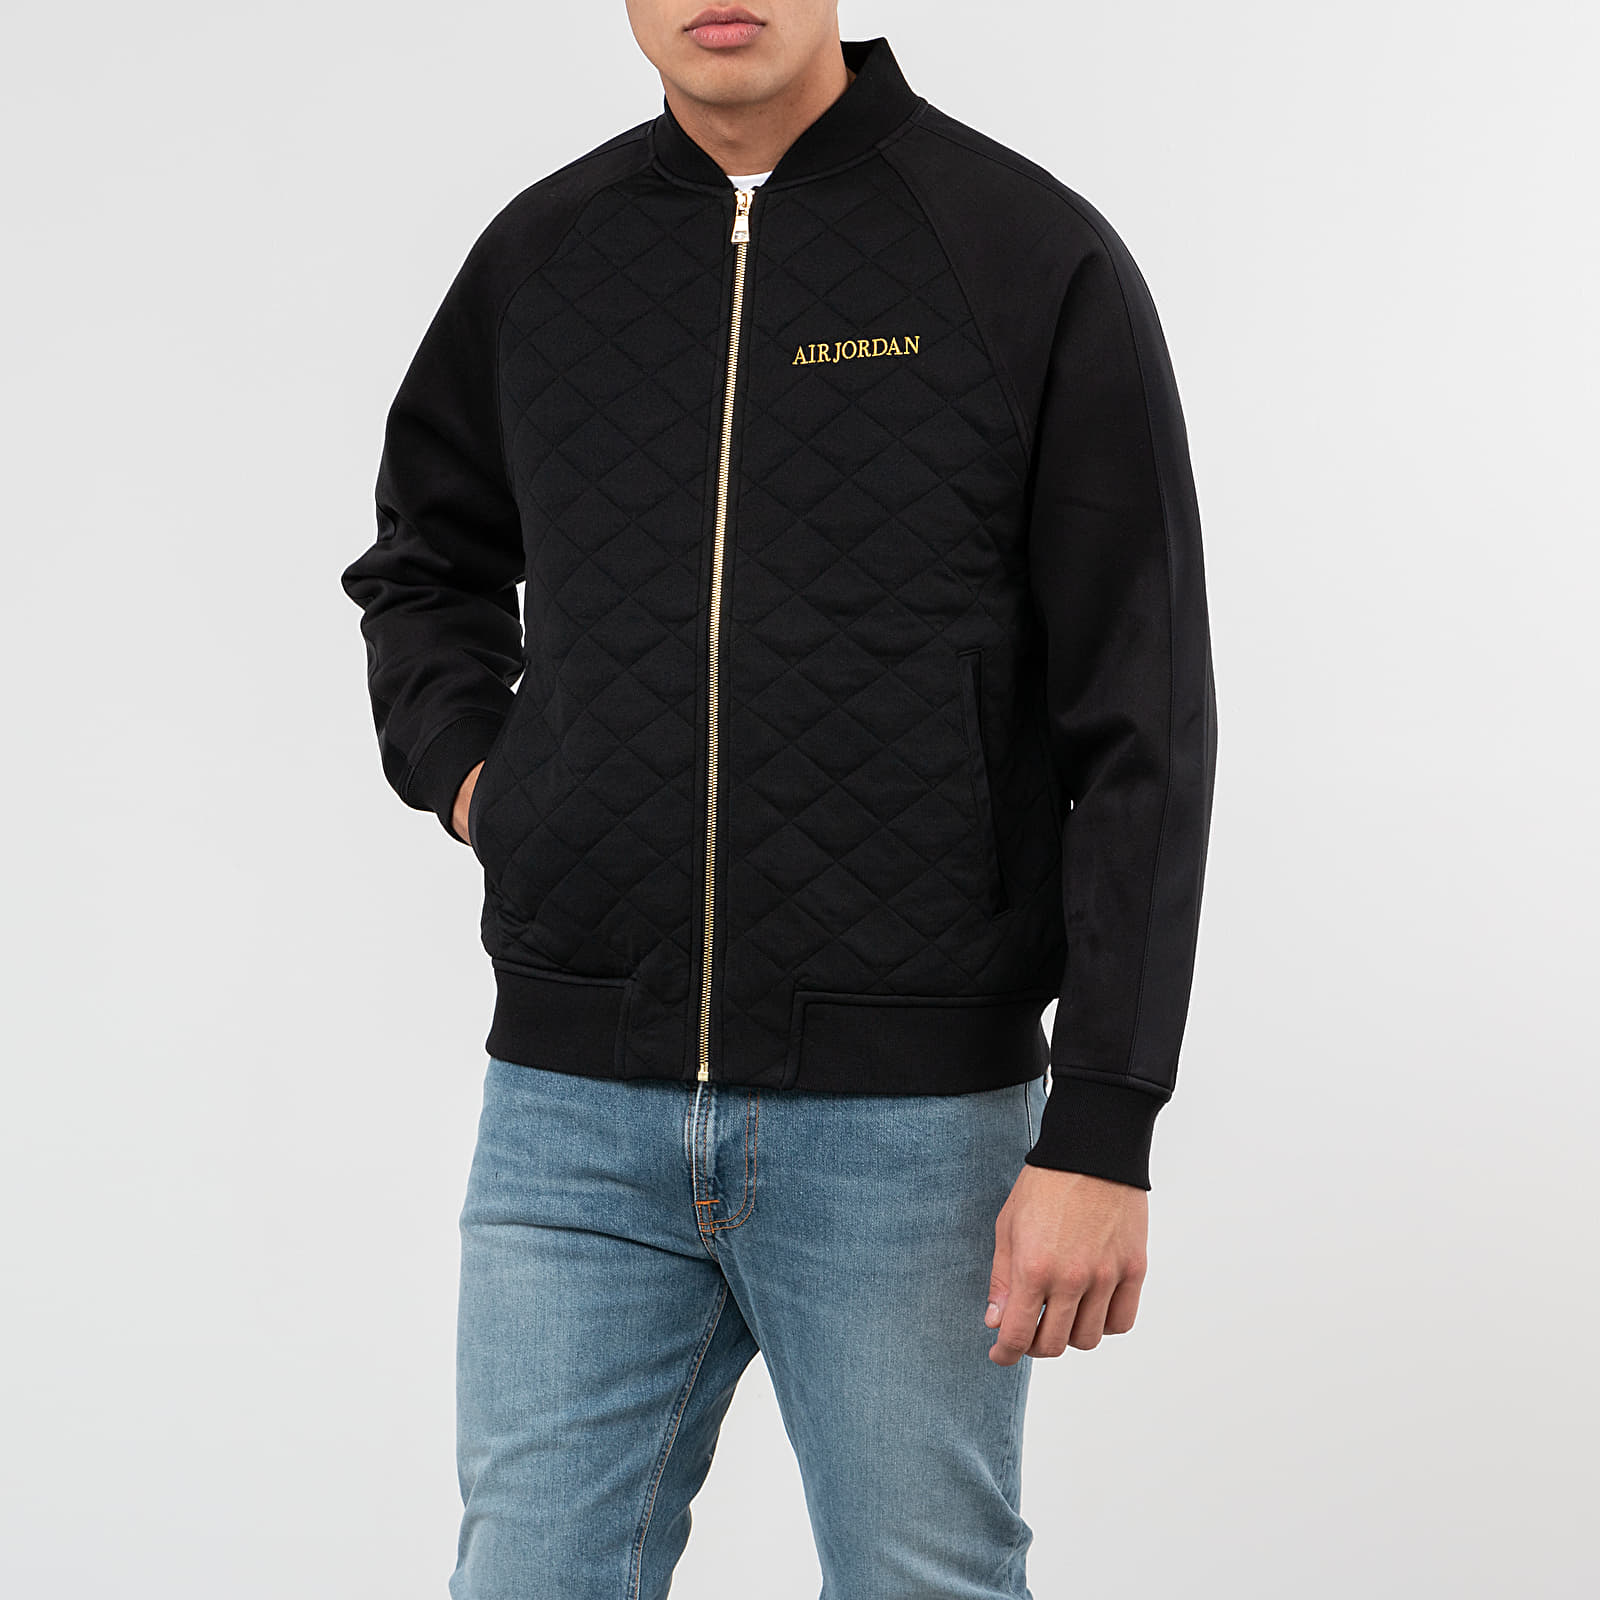 Jackets Jordan Remastered Quilted Jacket Black/ Black/ Black/ Metallic Gold